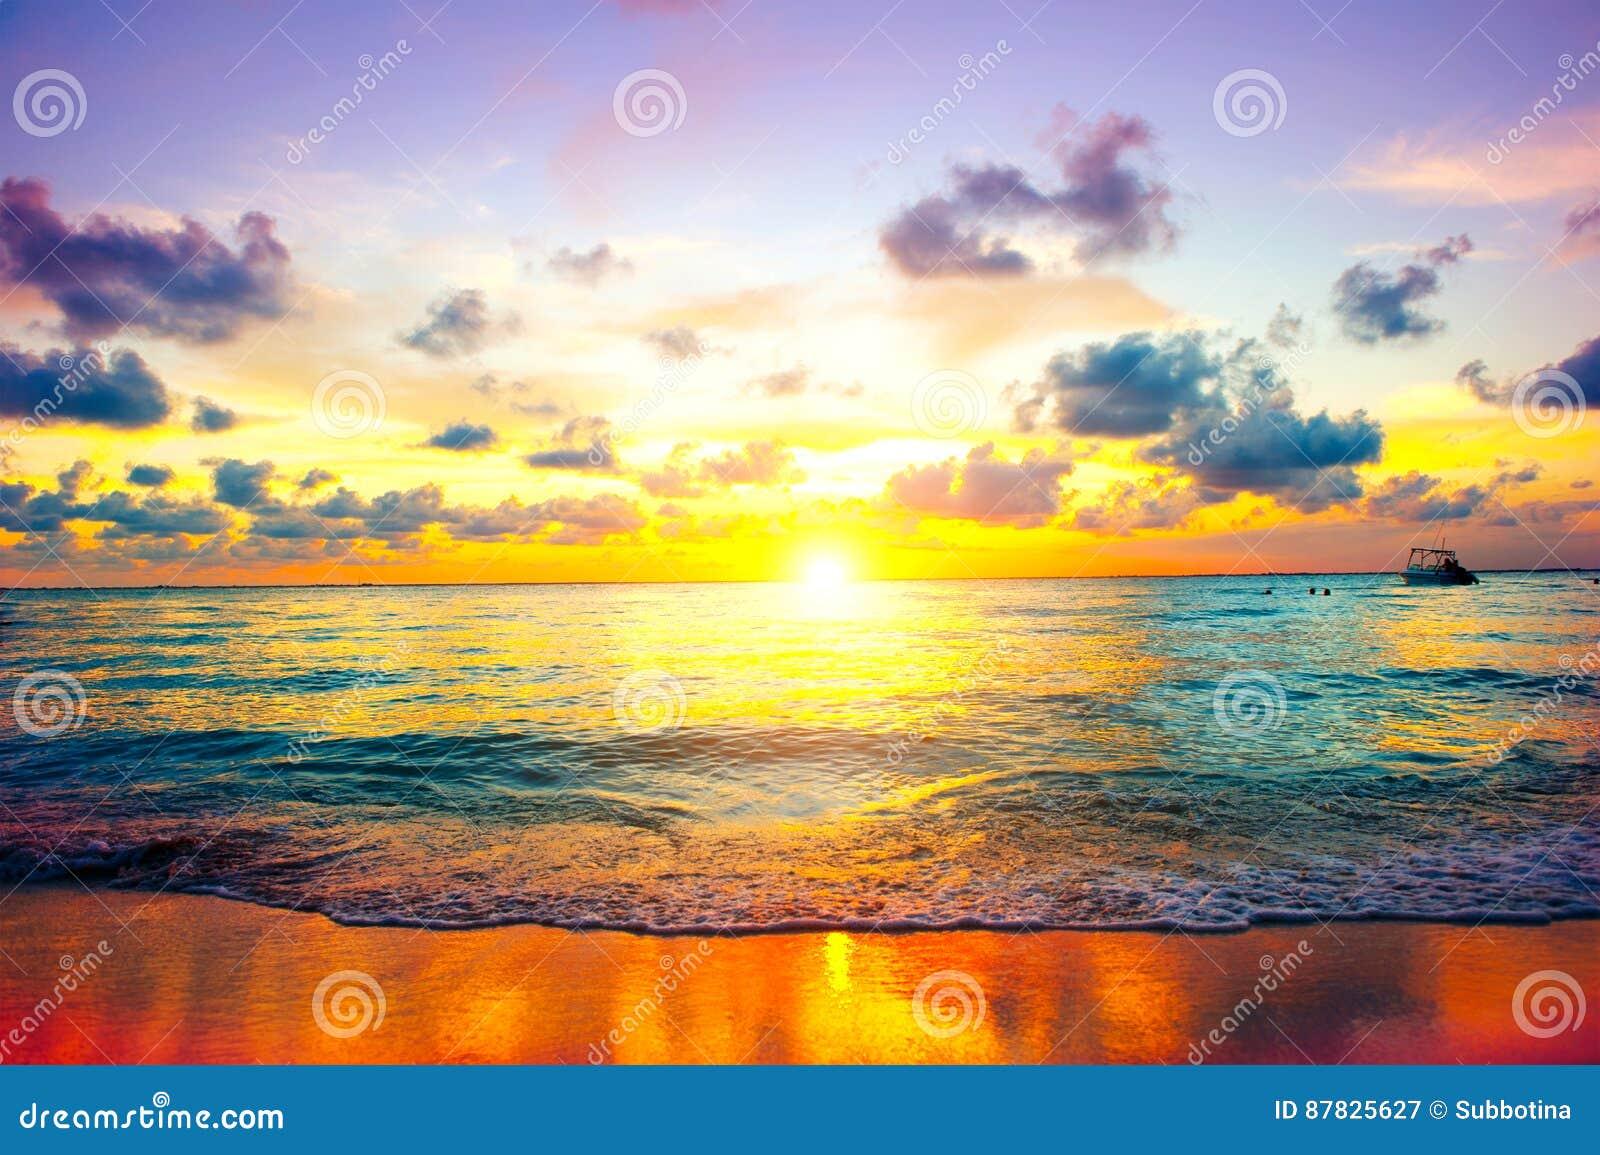 Zonsondergangstrand van Caraïbisch eiland